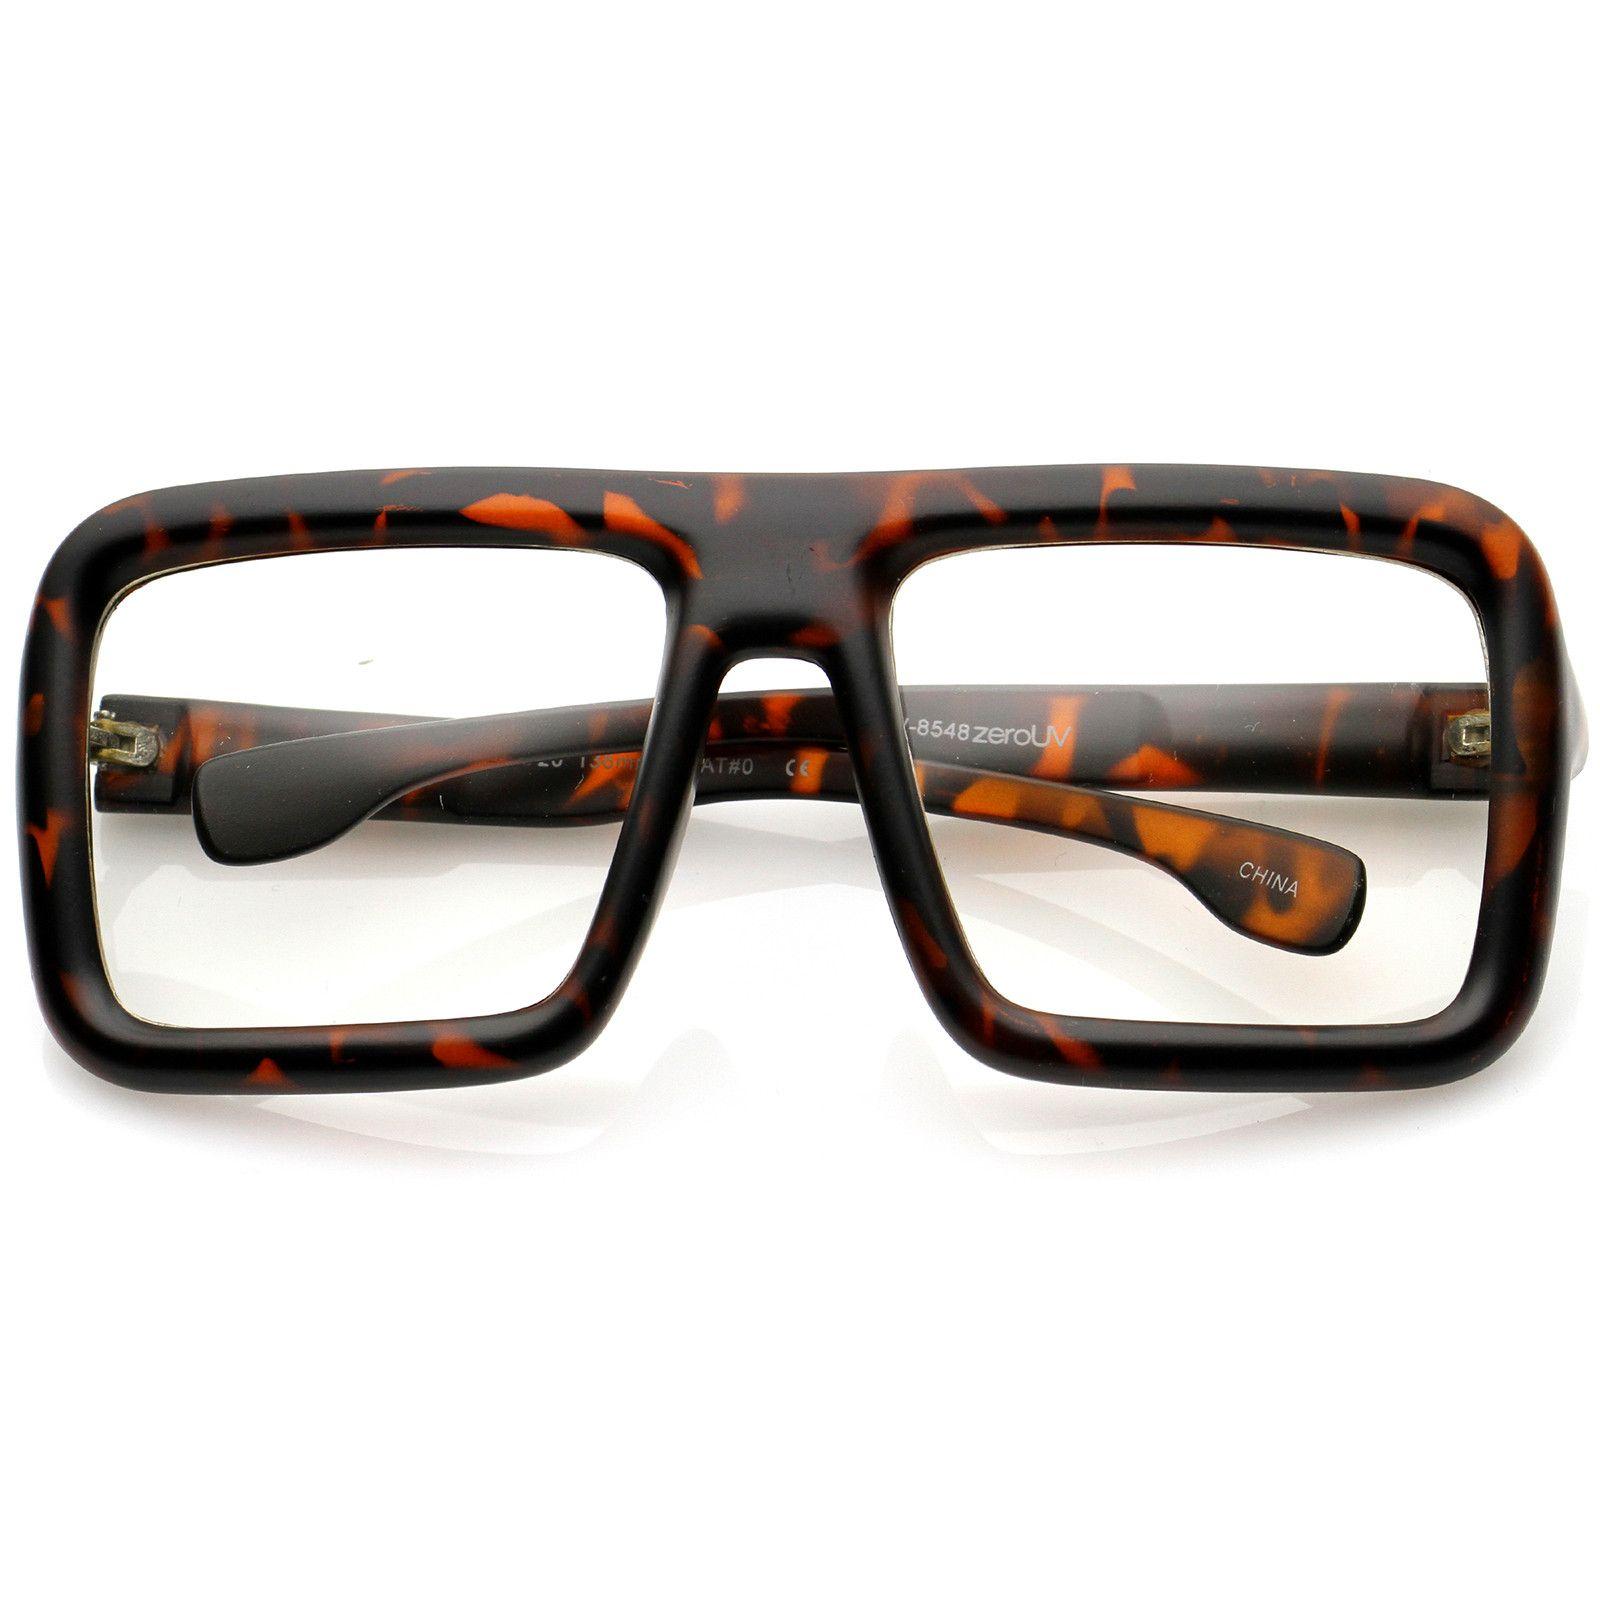 Oversize Bold Thick Frame Clear Lens Square Eyeglasses 58mm | Lentes ...